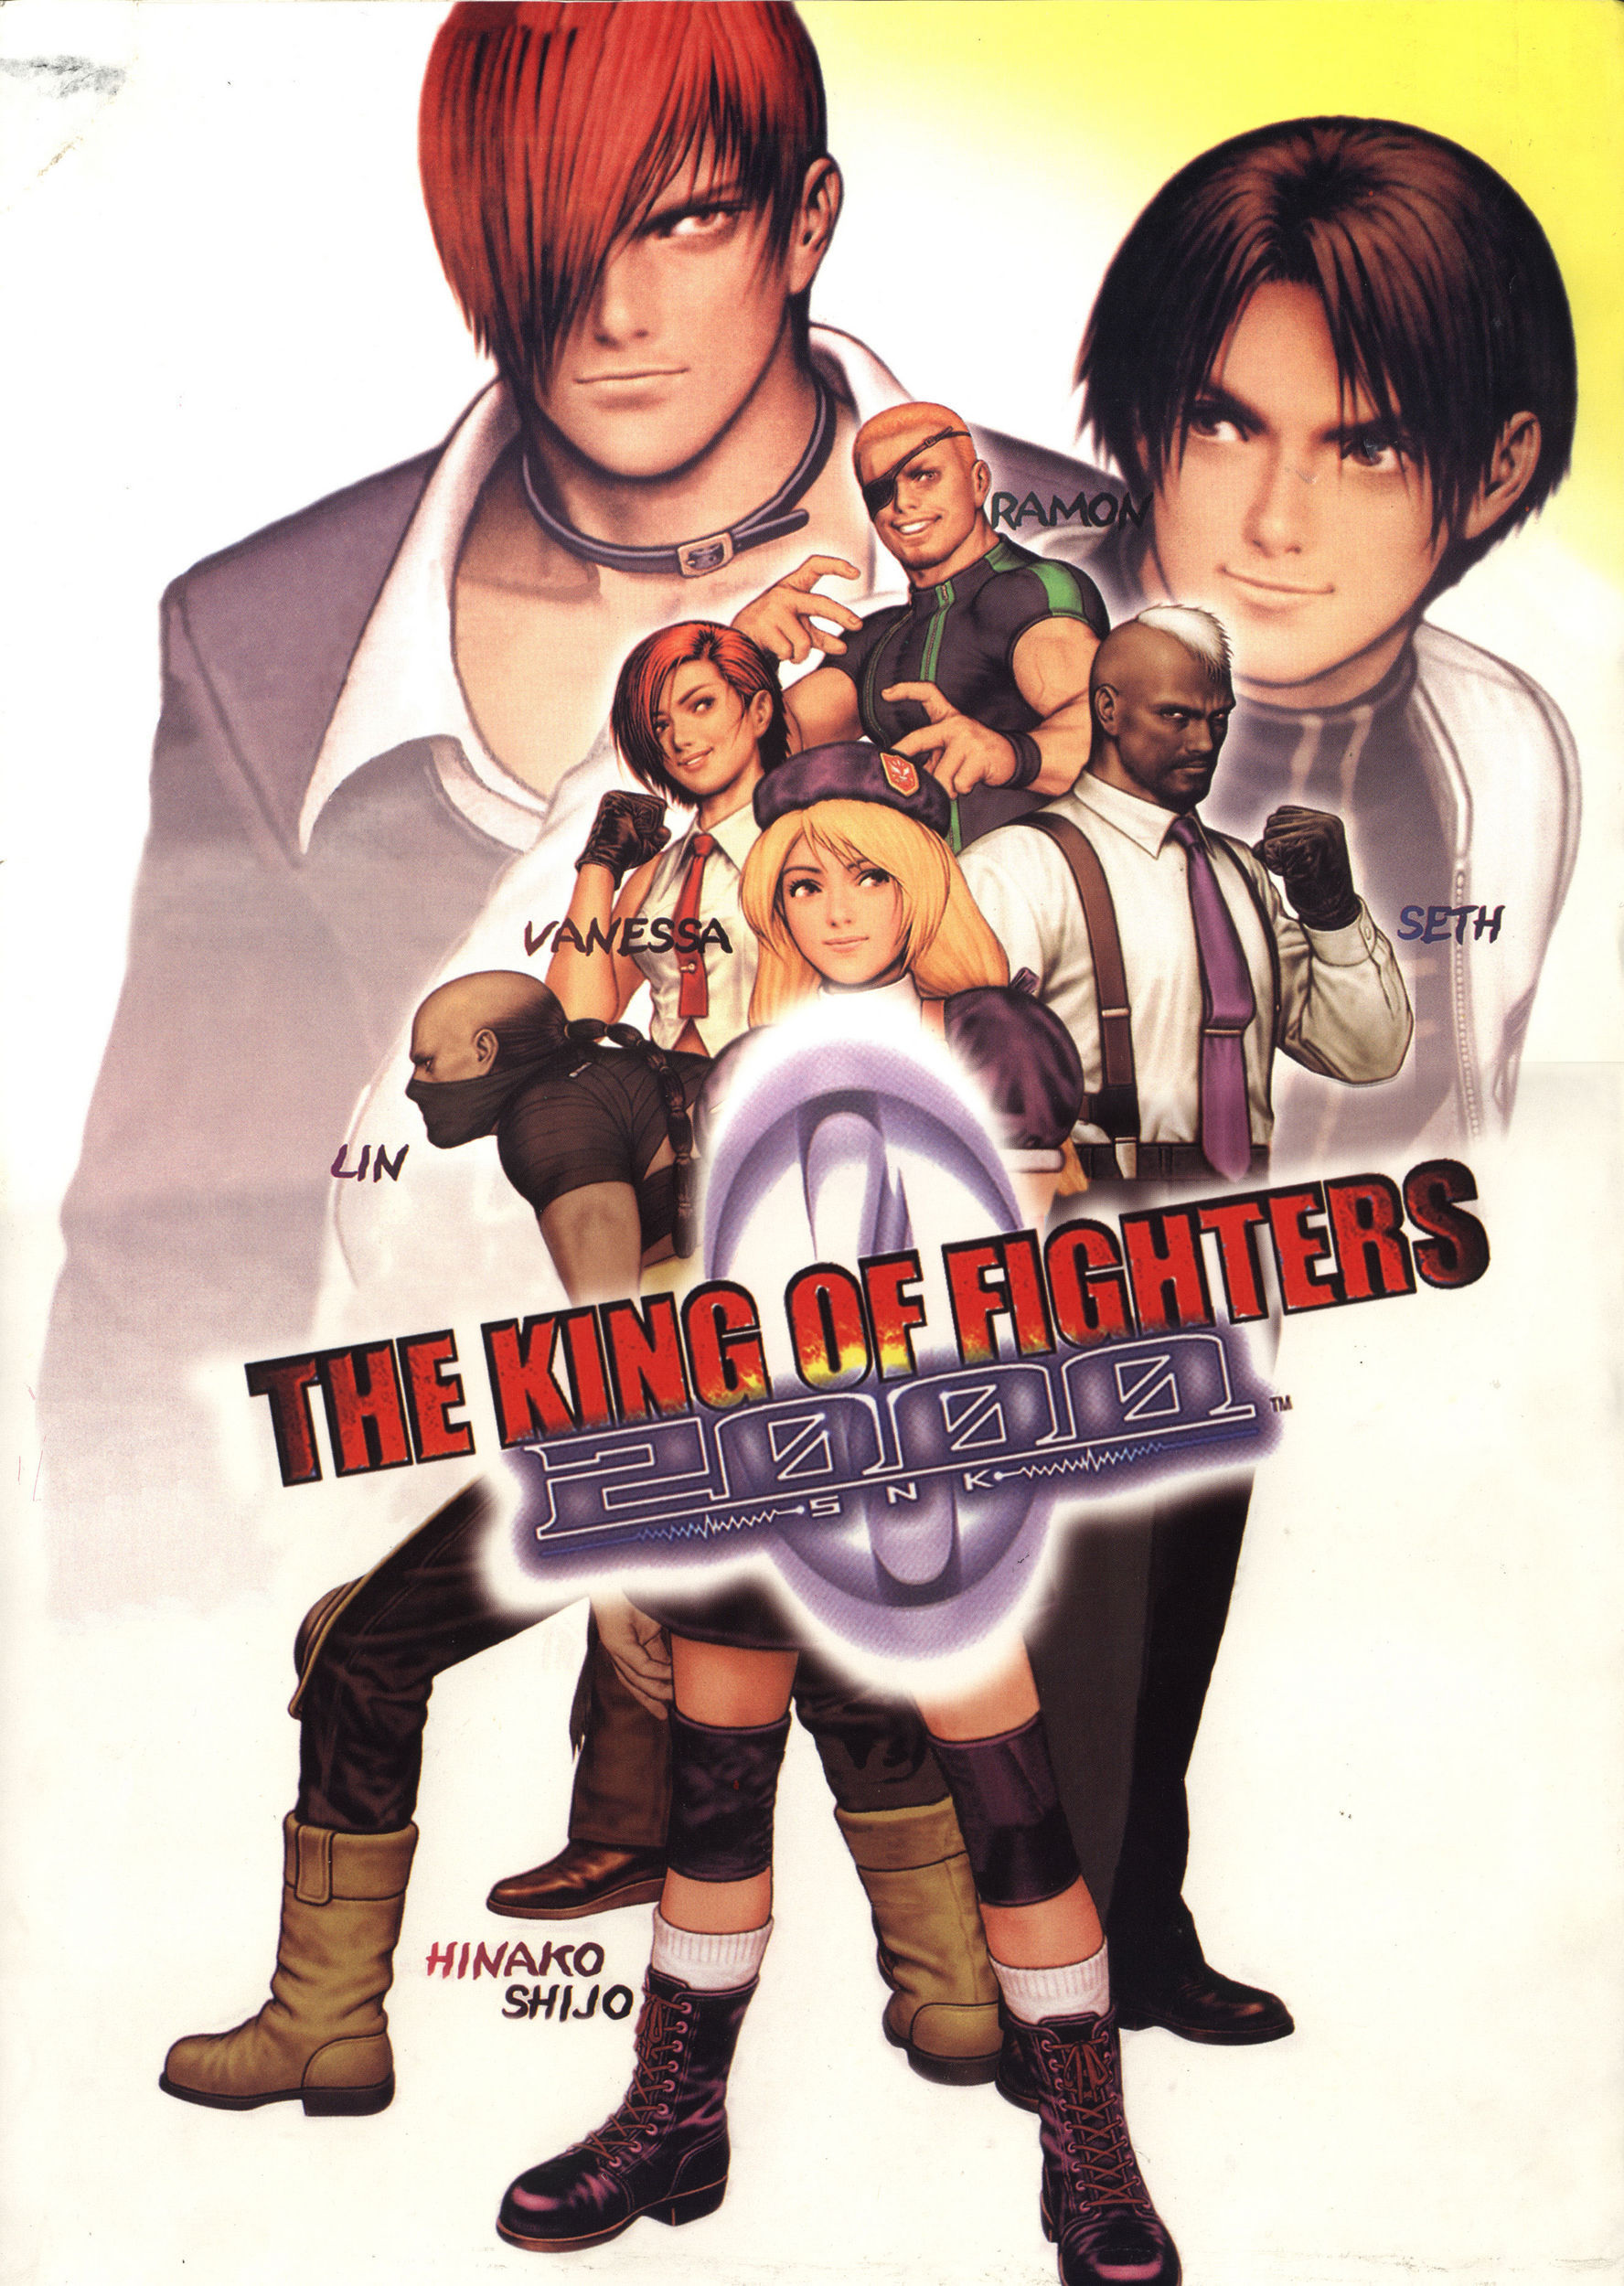 Kof 2000 The King Of Fighters Photo 13368462 Fanpop